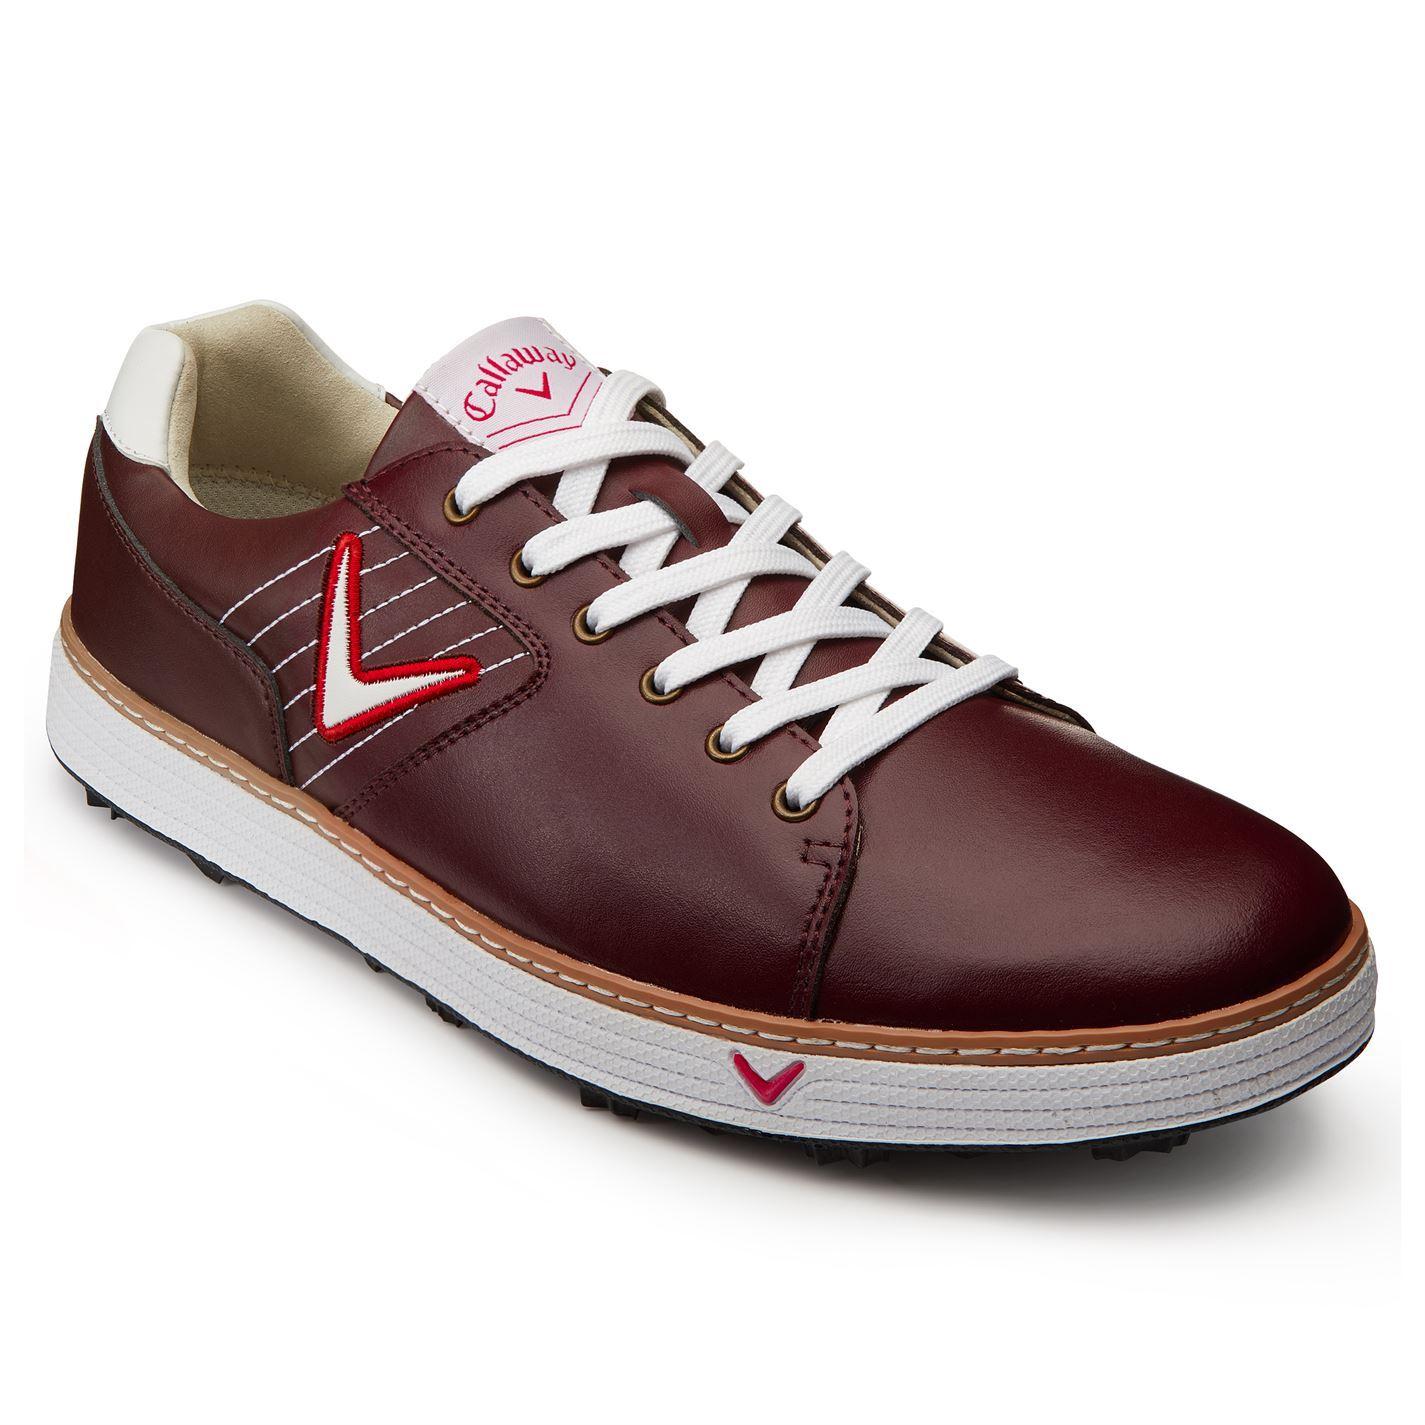 Callaway-Delmar-Urban-Golf-Shoes-Mens-Spikeless-Footwear thumbnail 7